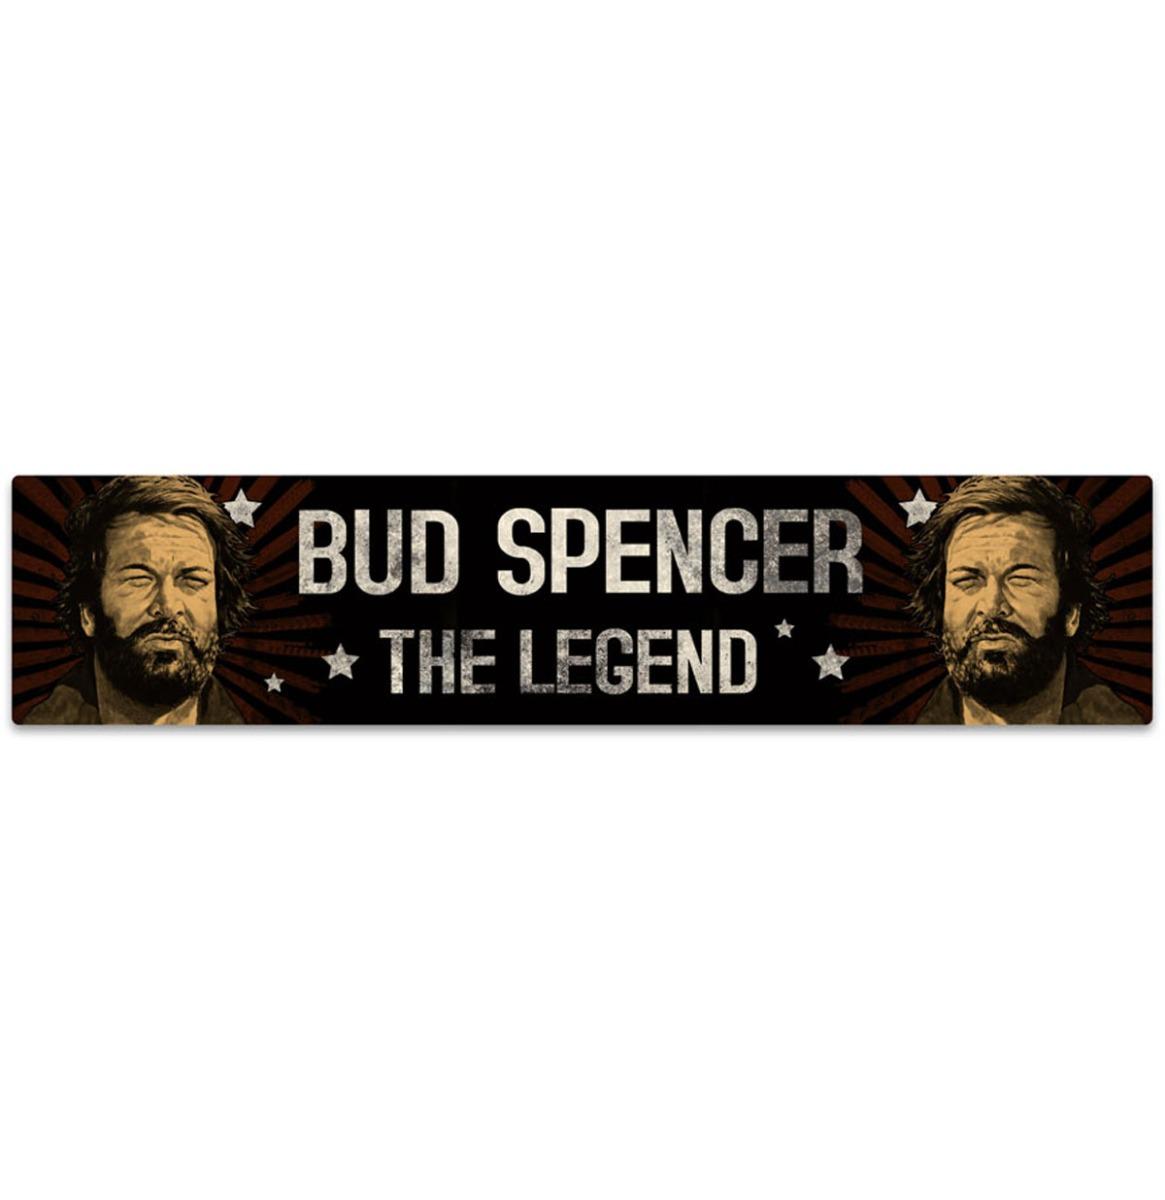 Bud Spencer The Legend Street Sign Magneet 16 x 3.5 cm